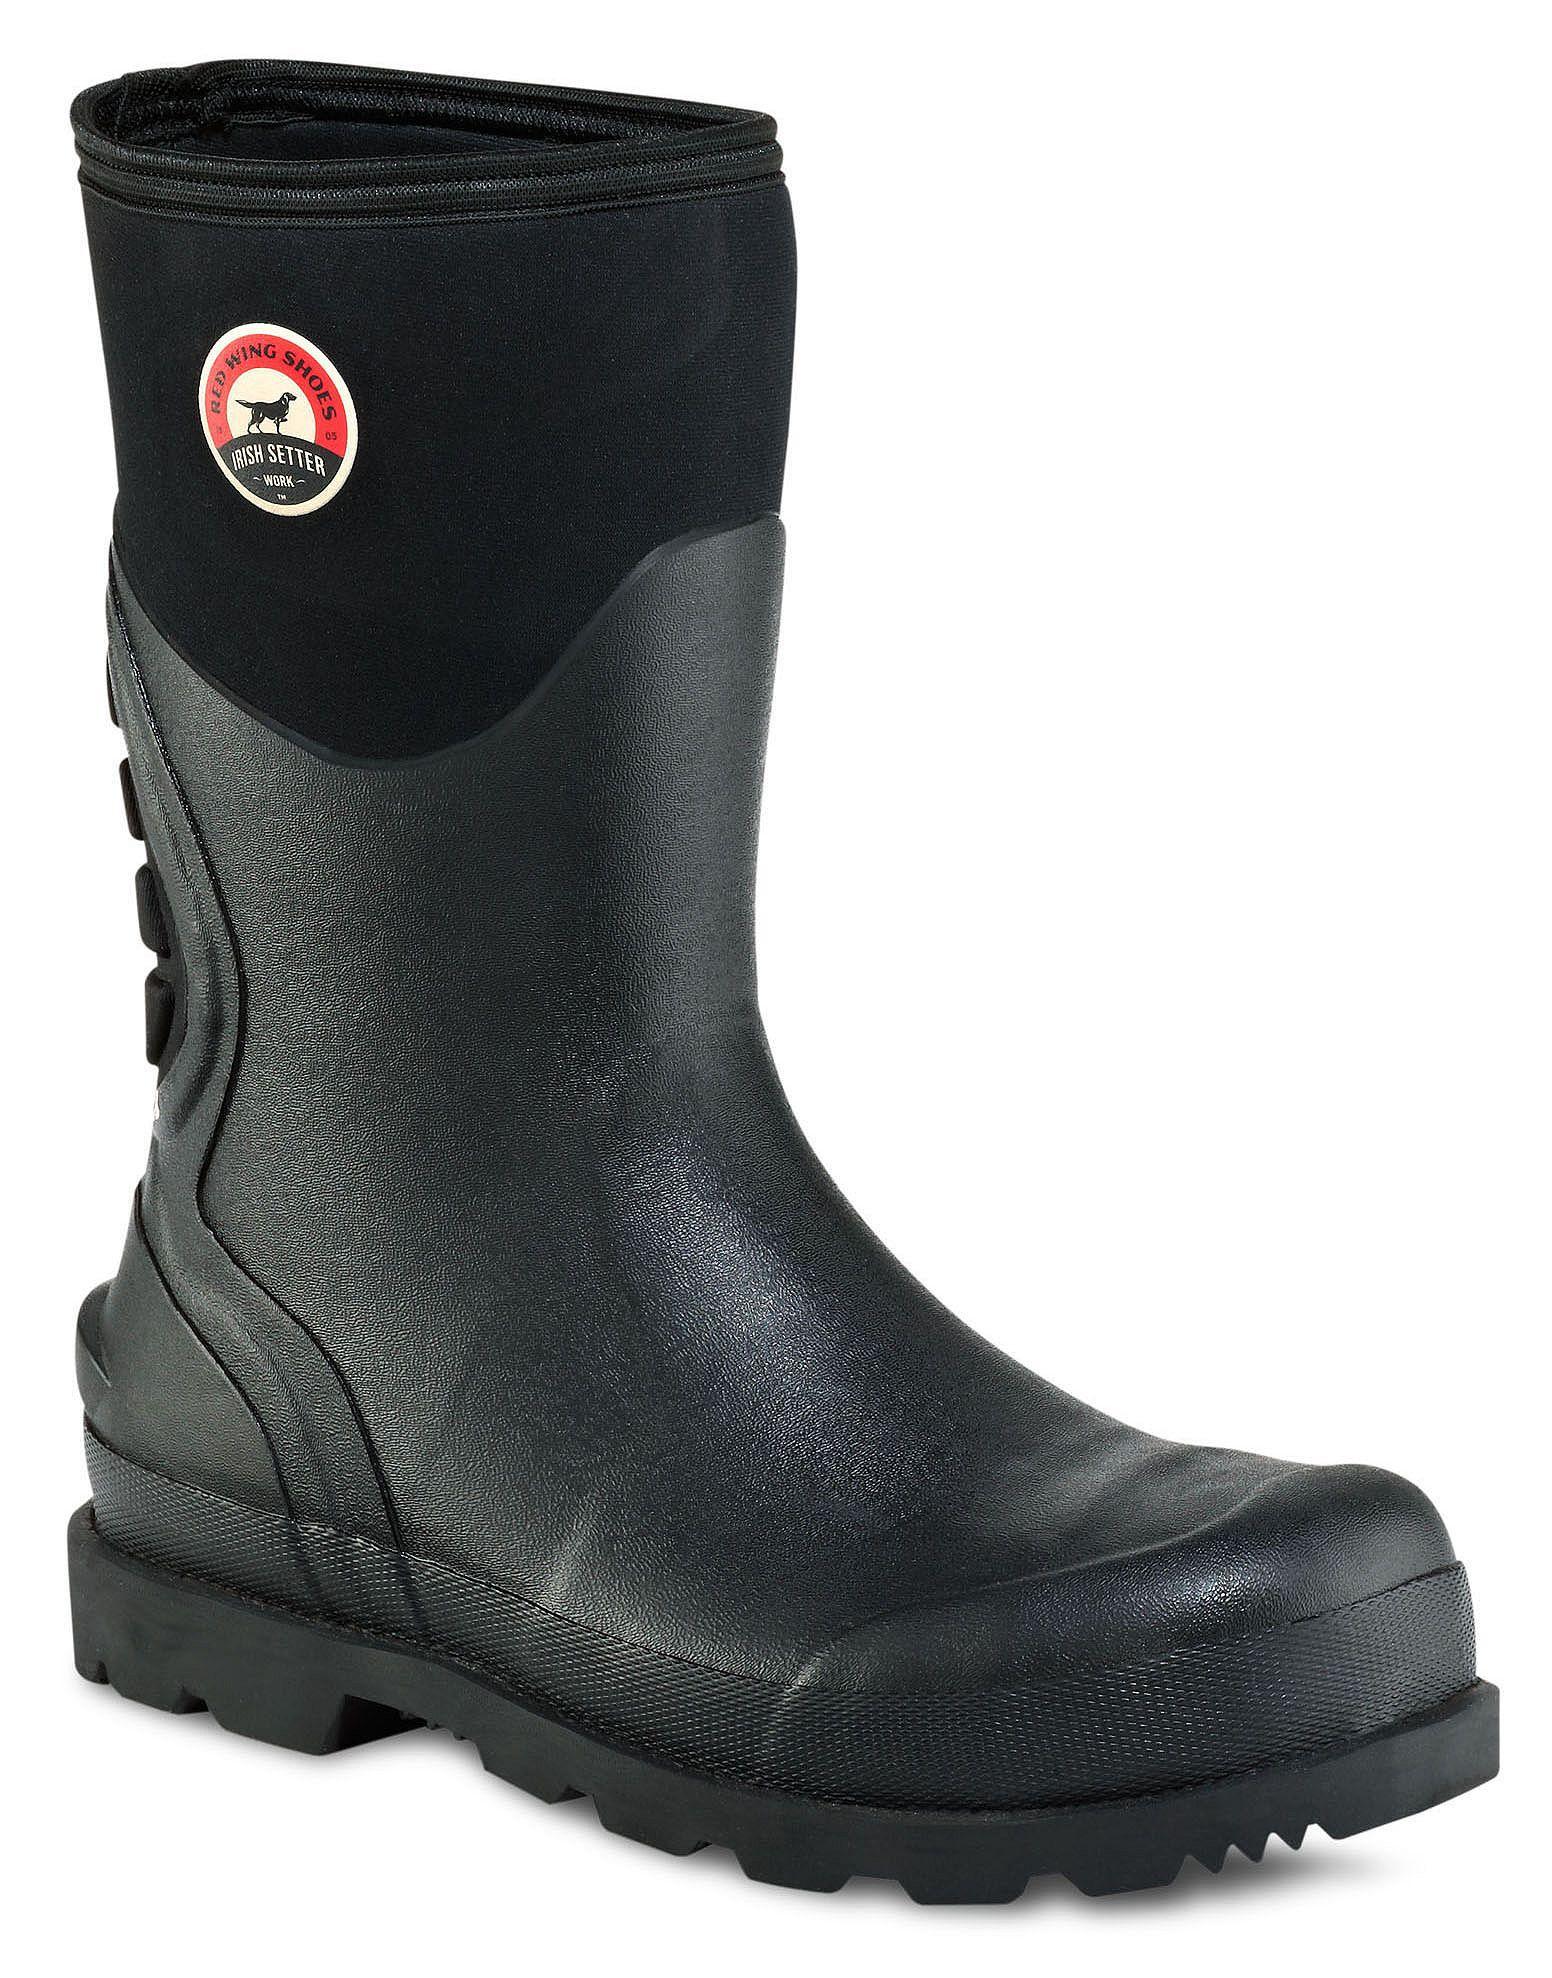 Red Wing Steel Toe Boots - Sheplers